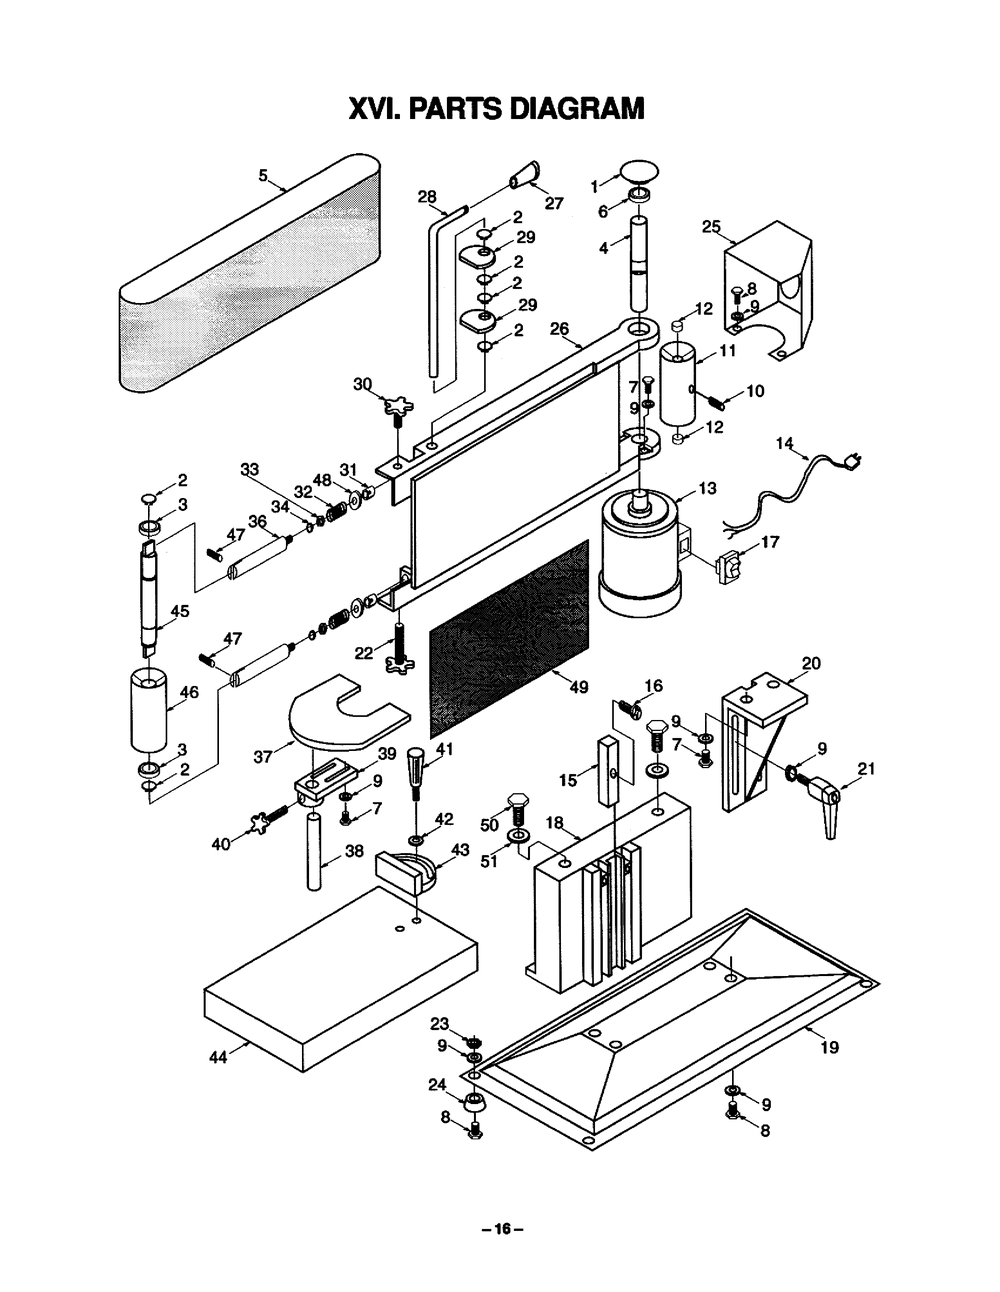 2000 expedition radio wire diagram likewise ridgid 300 switch wiring diagram besides kenwood kdc mp345u wiring